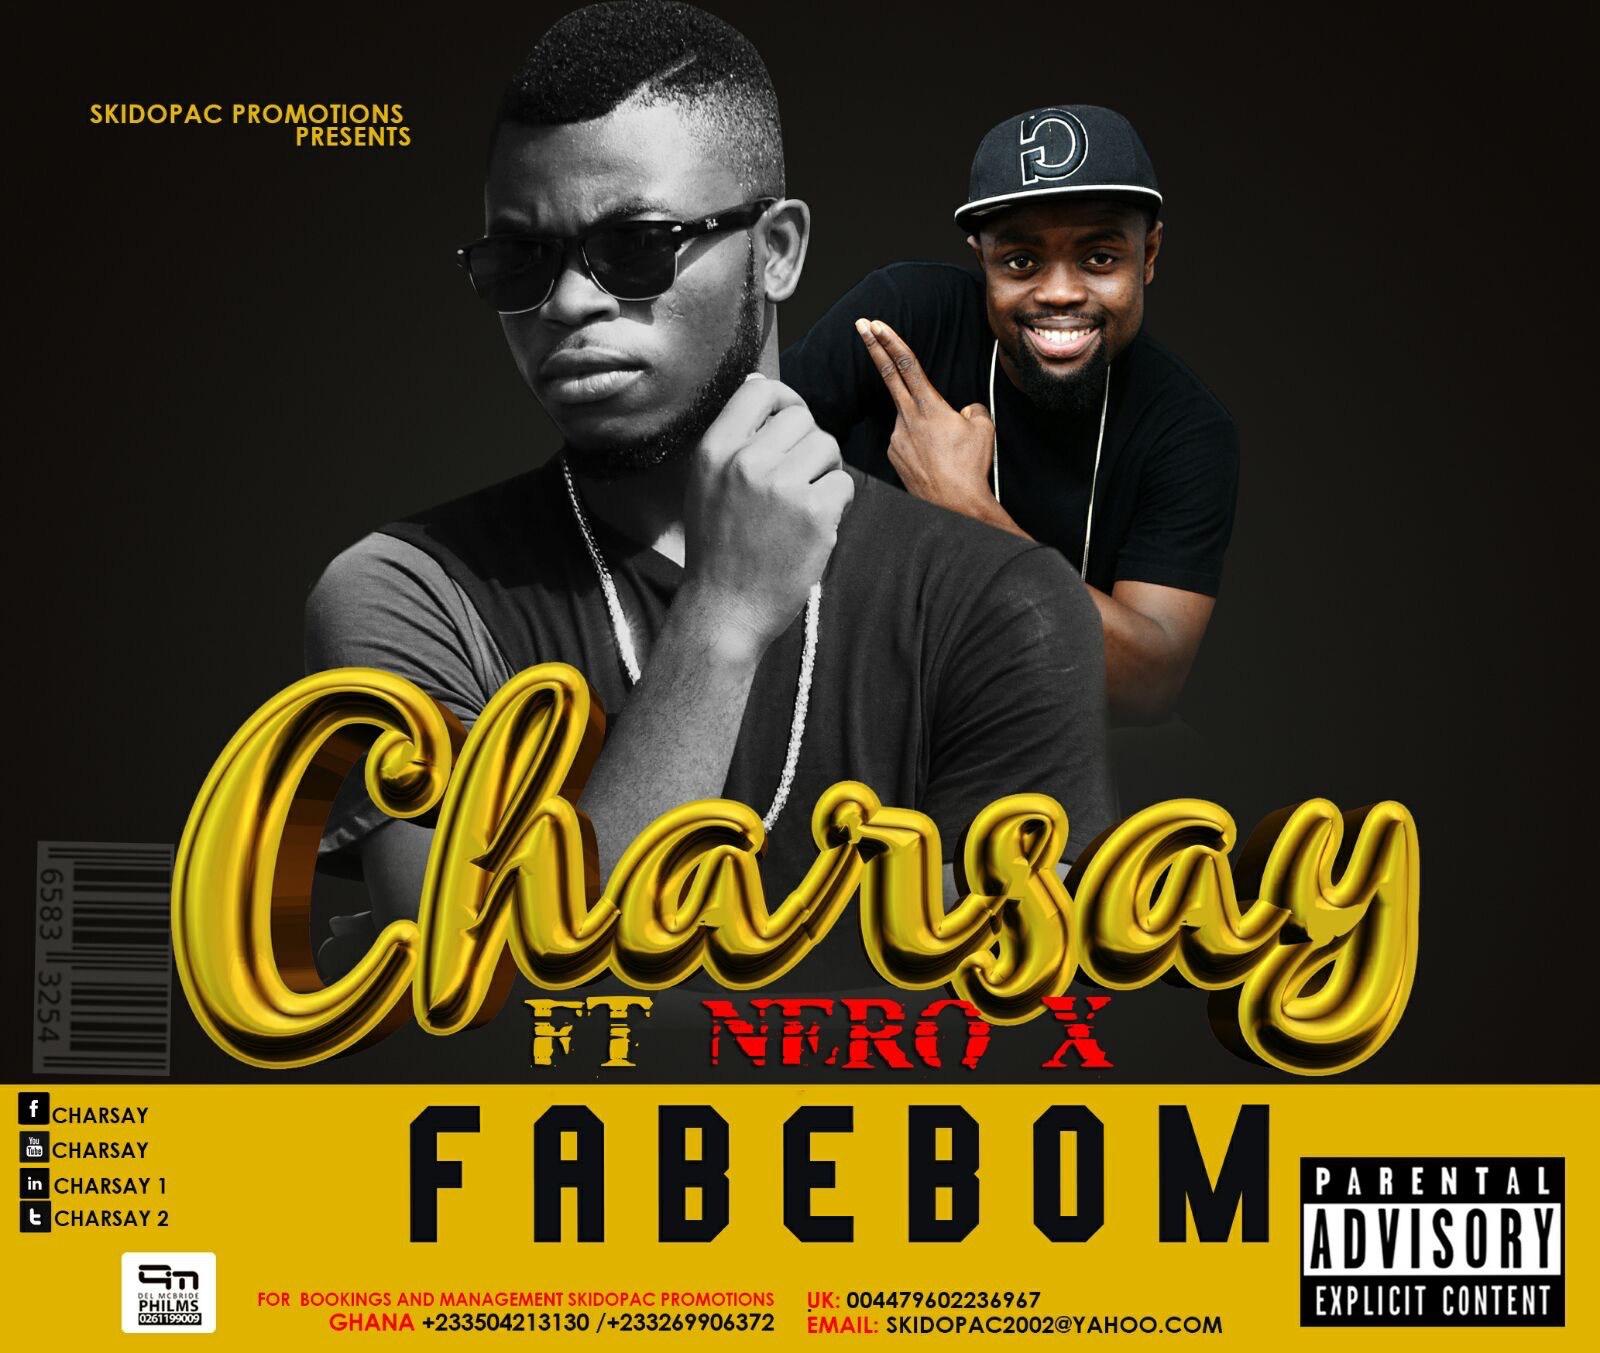 Charsay Fabebom ft